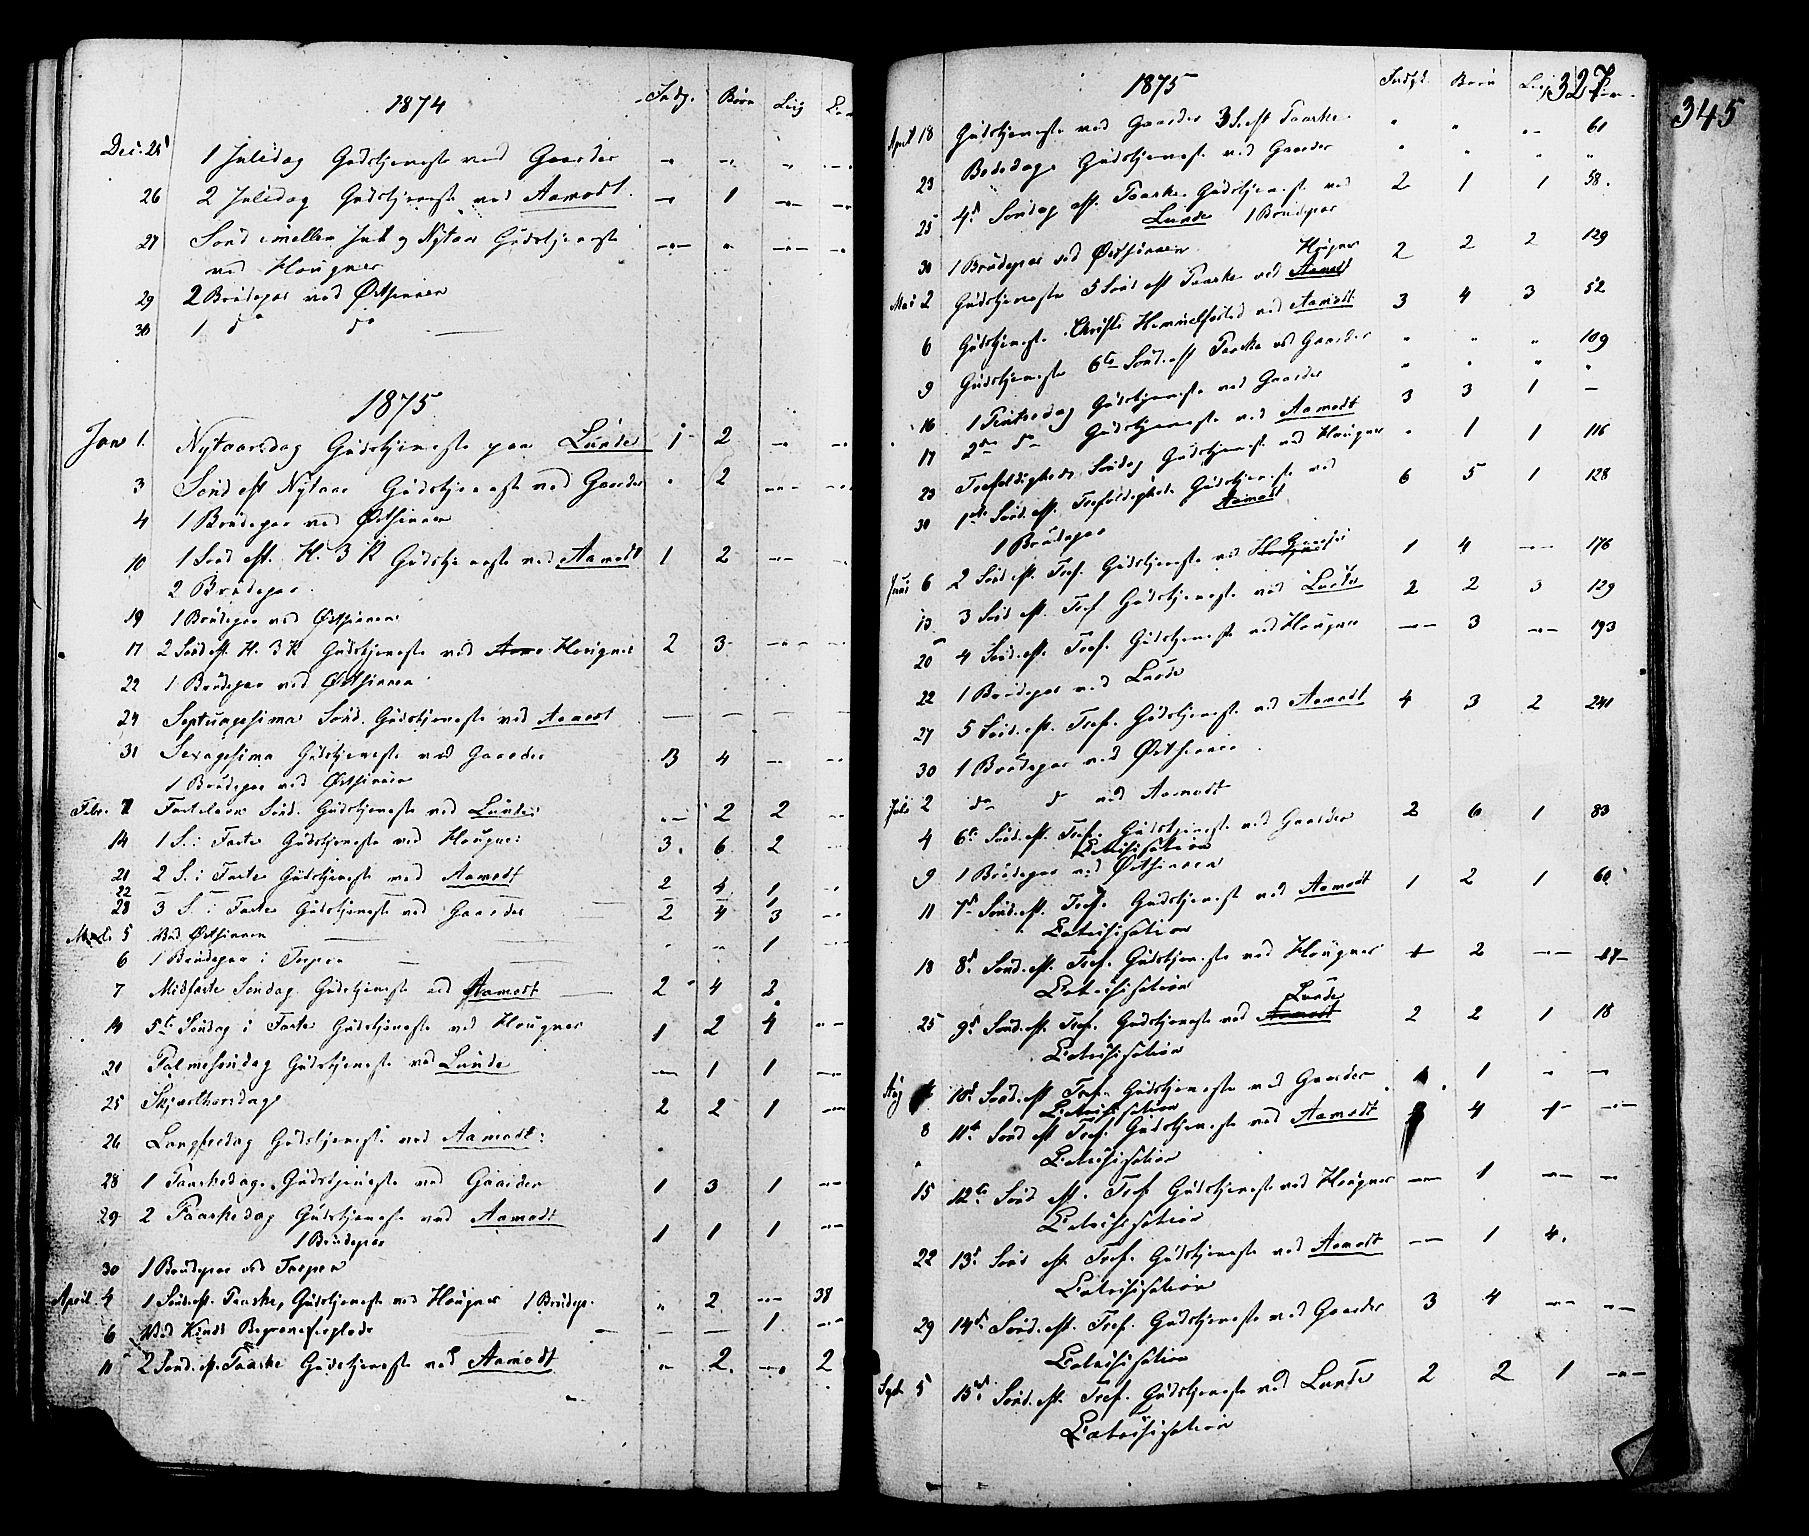 SAH, Nordre Land prestekontor, Ministerialbok nr. 2, 1872-1881, s. 327